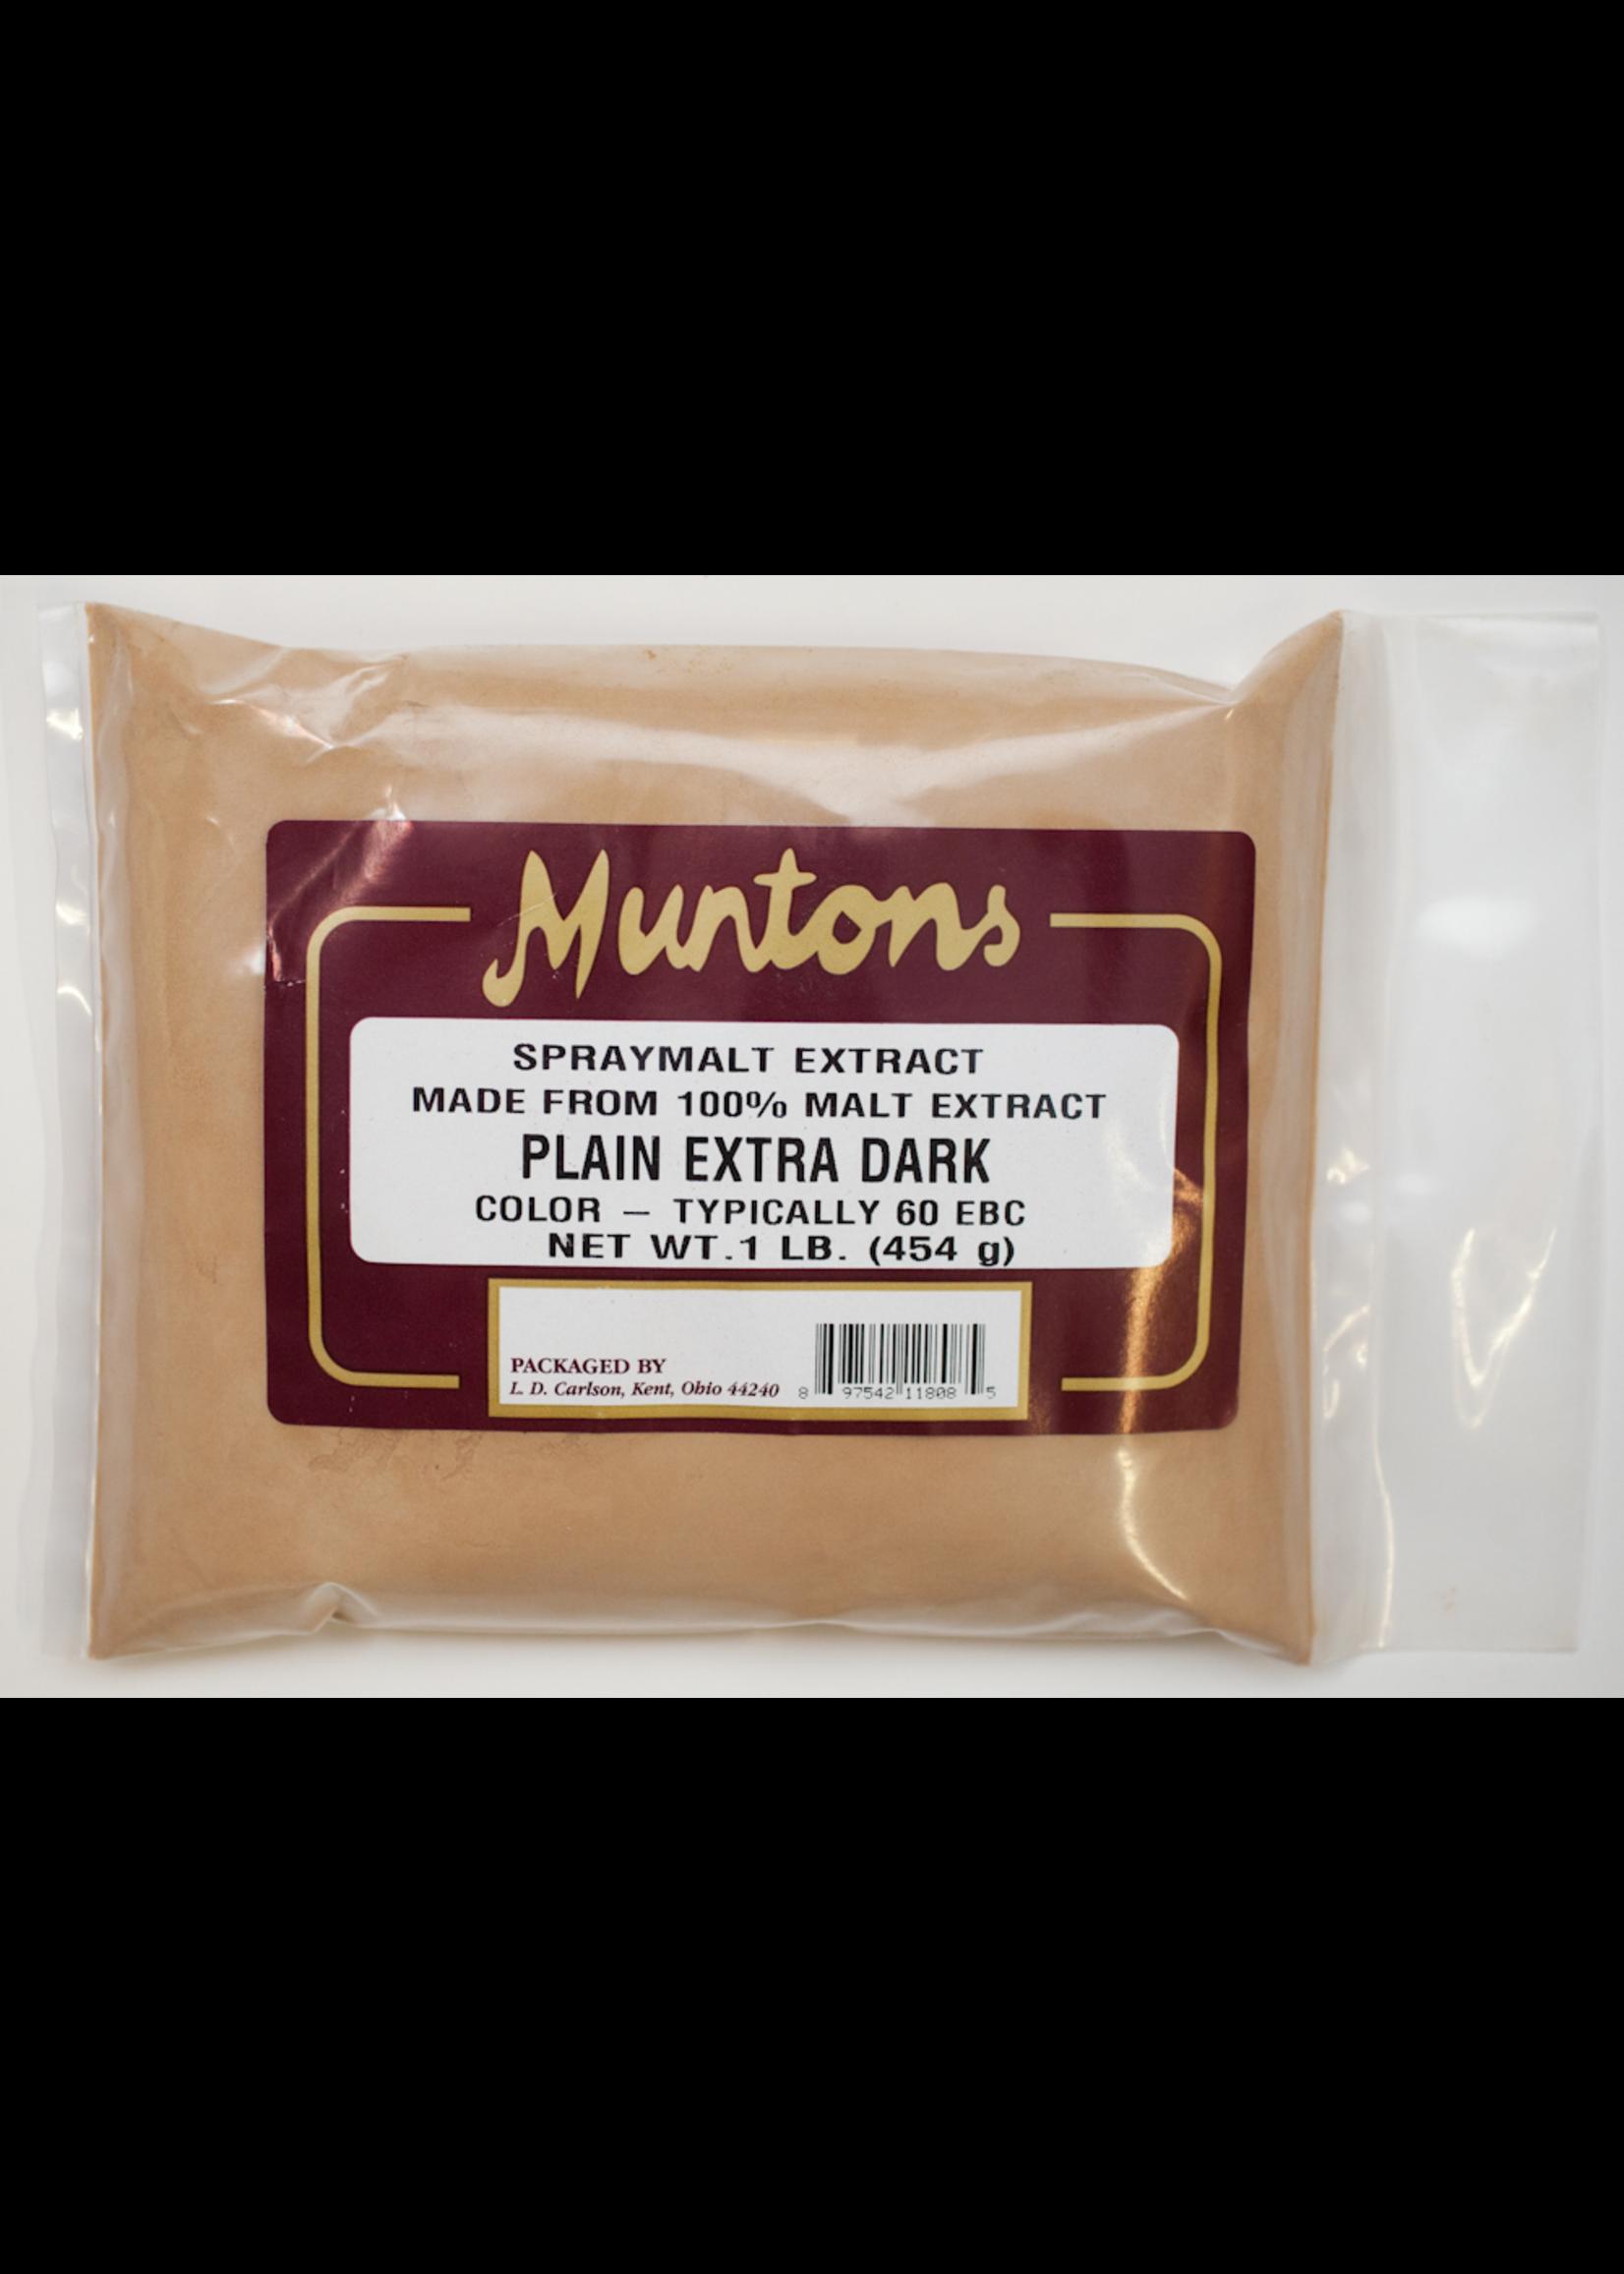 Extracts/Adjuncts Muntons Plain Extra Dark Spraymalt Dry Malt Extract (DME) - 1 LB